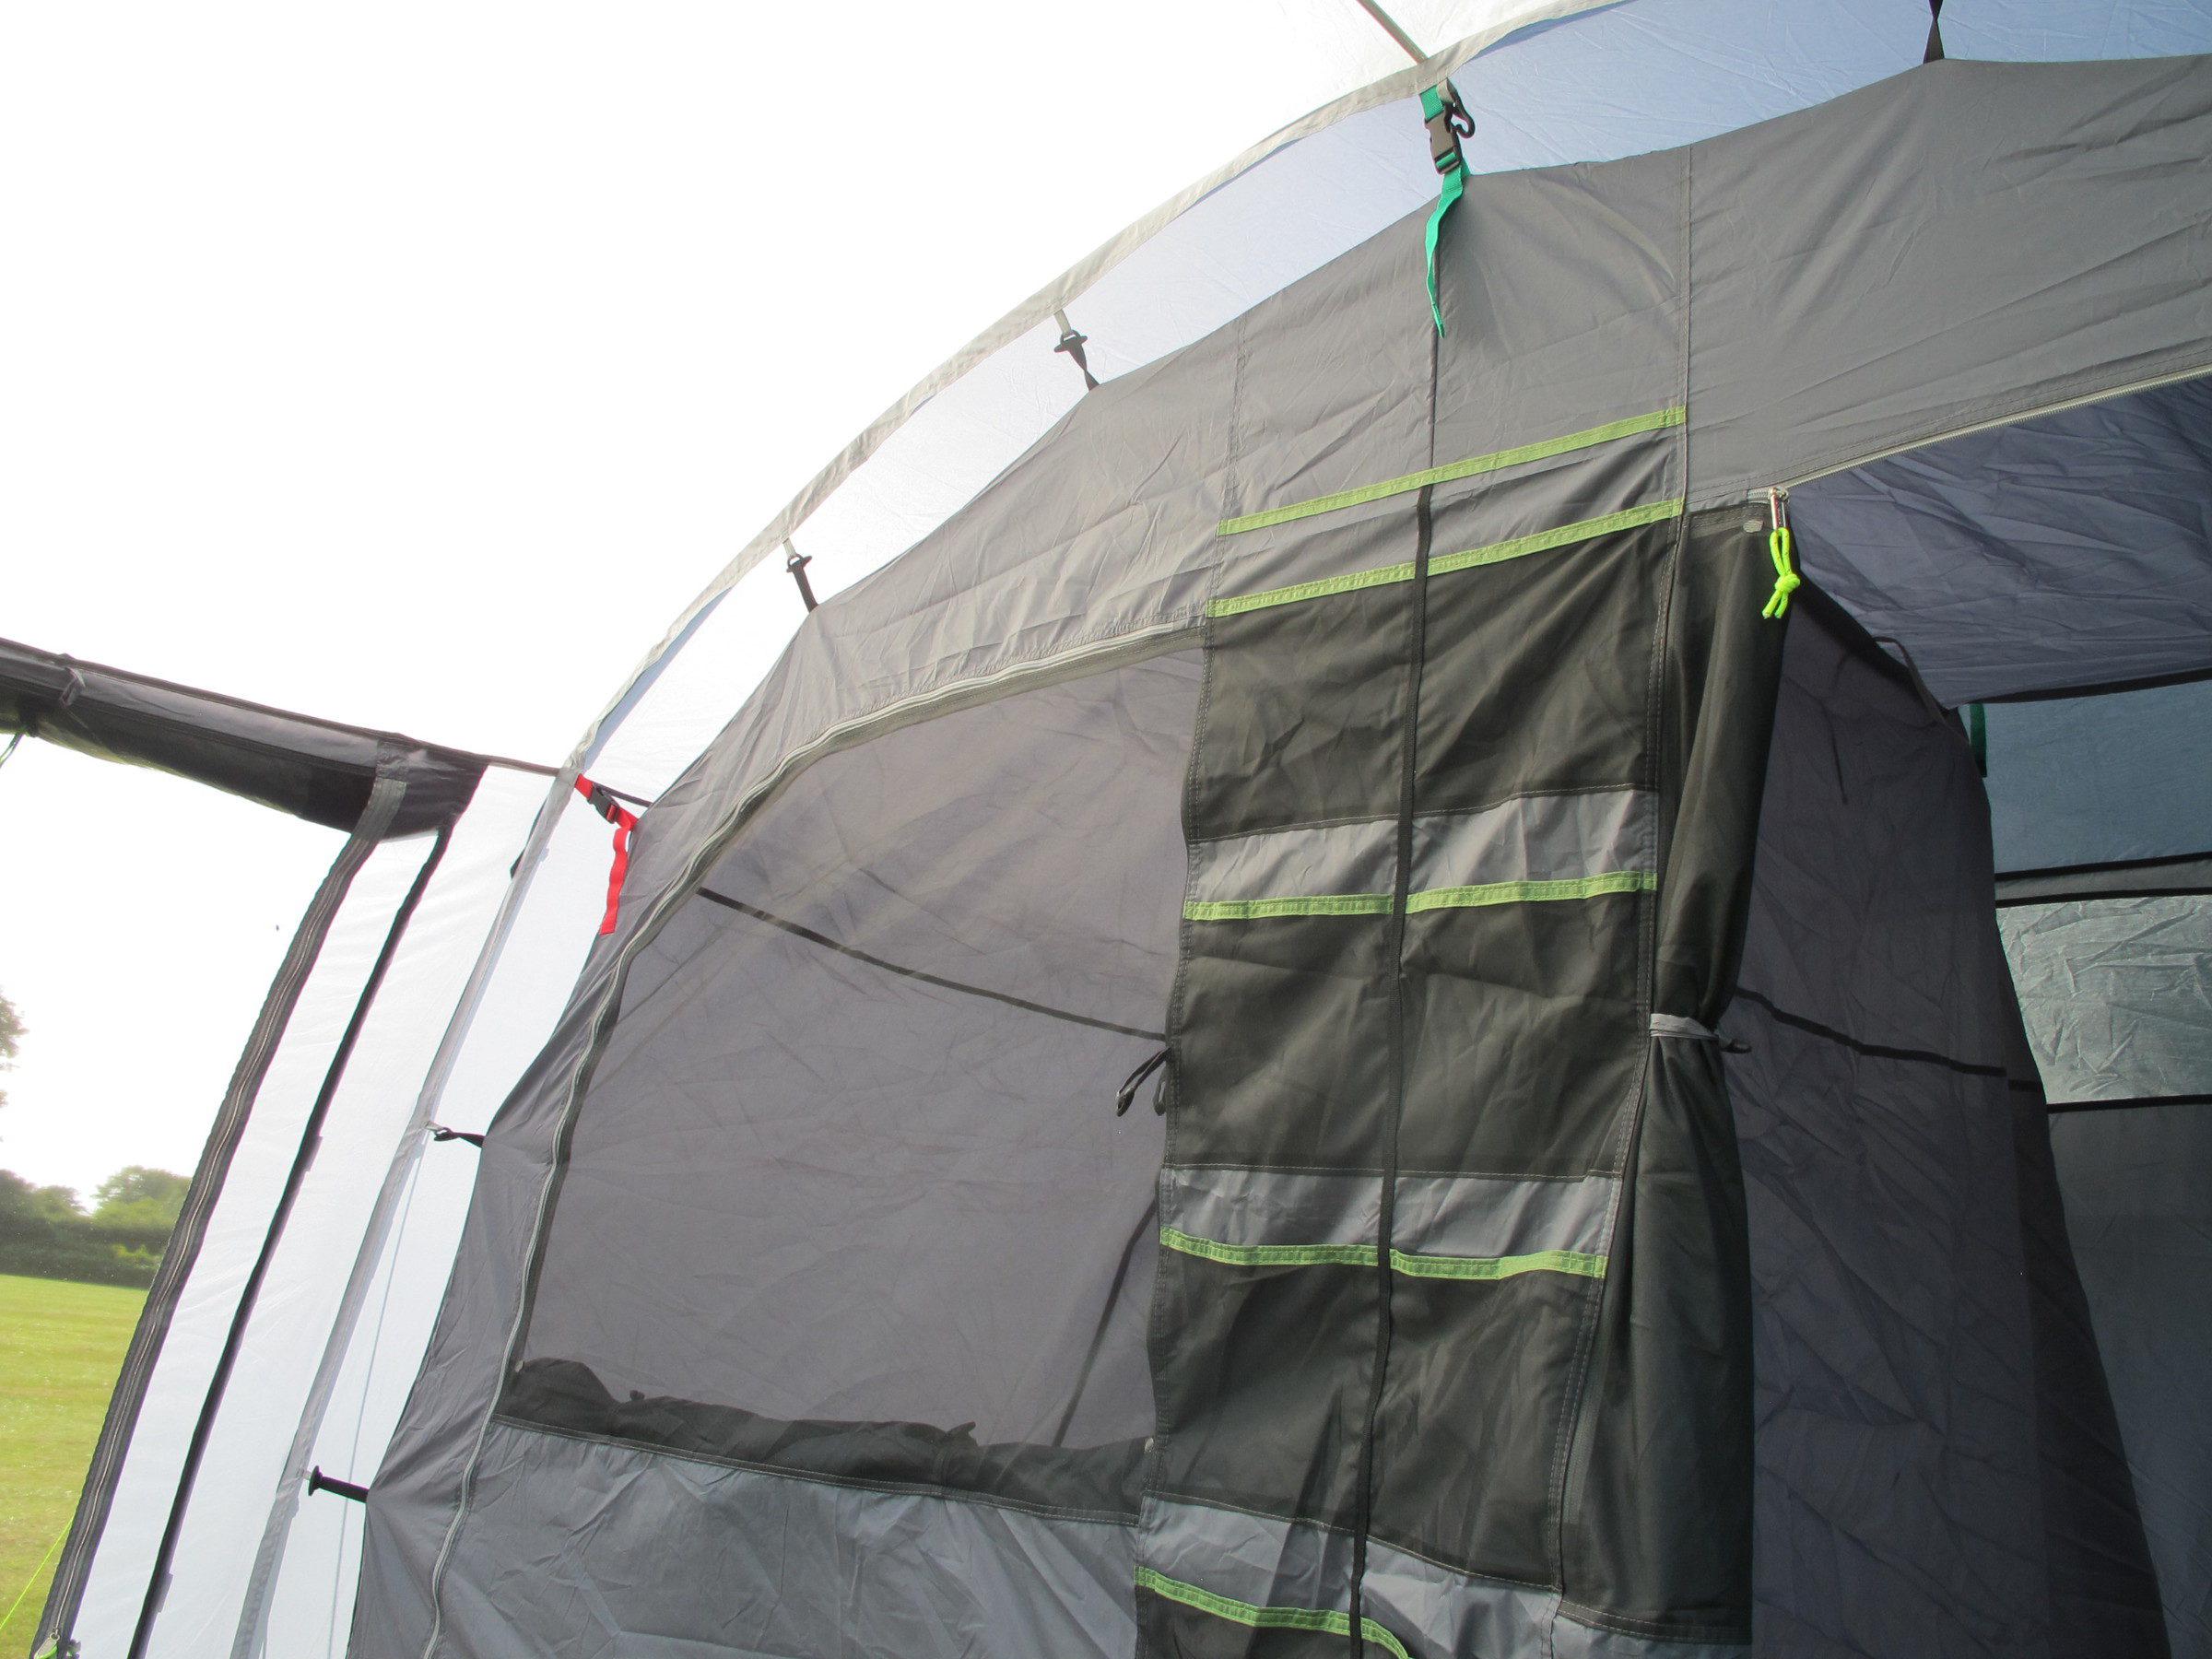 Kampa Hayling 4 poled bedroom 2018